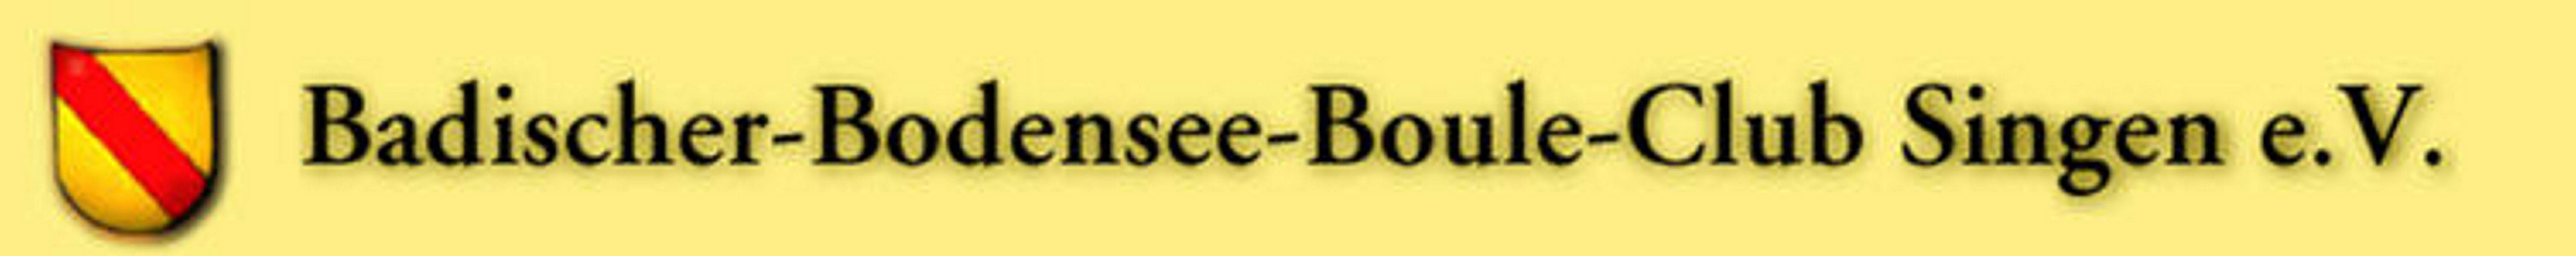 BBBC-Singen